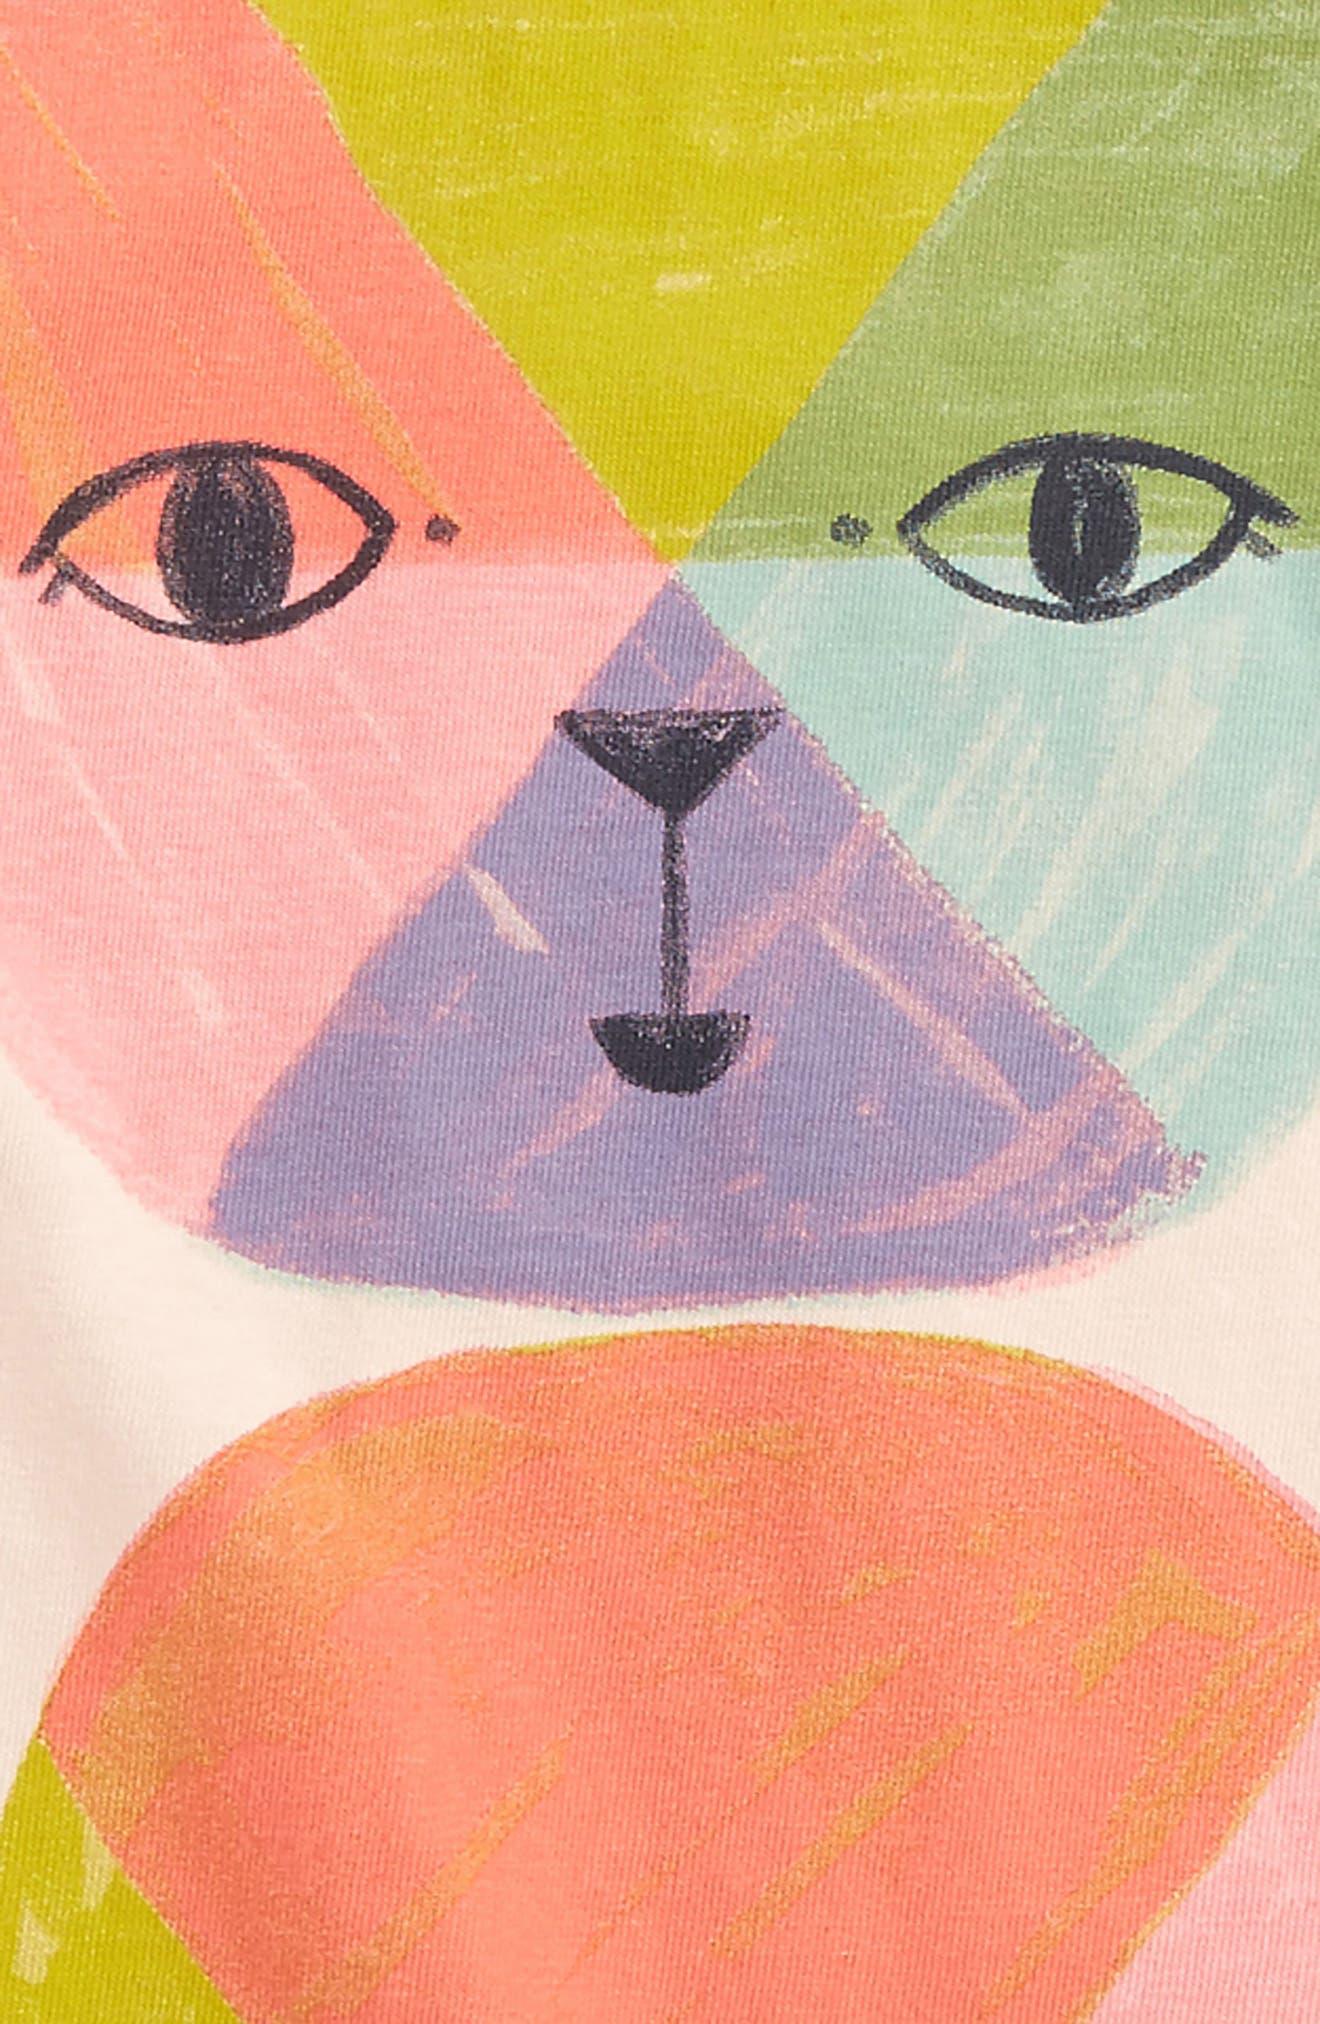 Hamish McHamish Tee,                             Alternate thumbnail 3, color,                             680